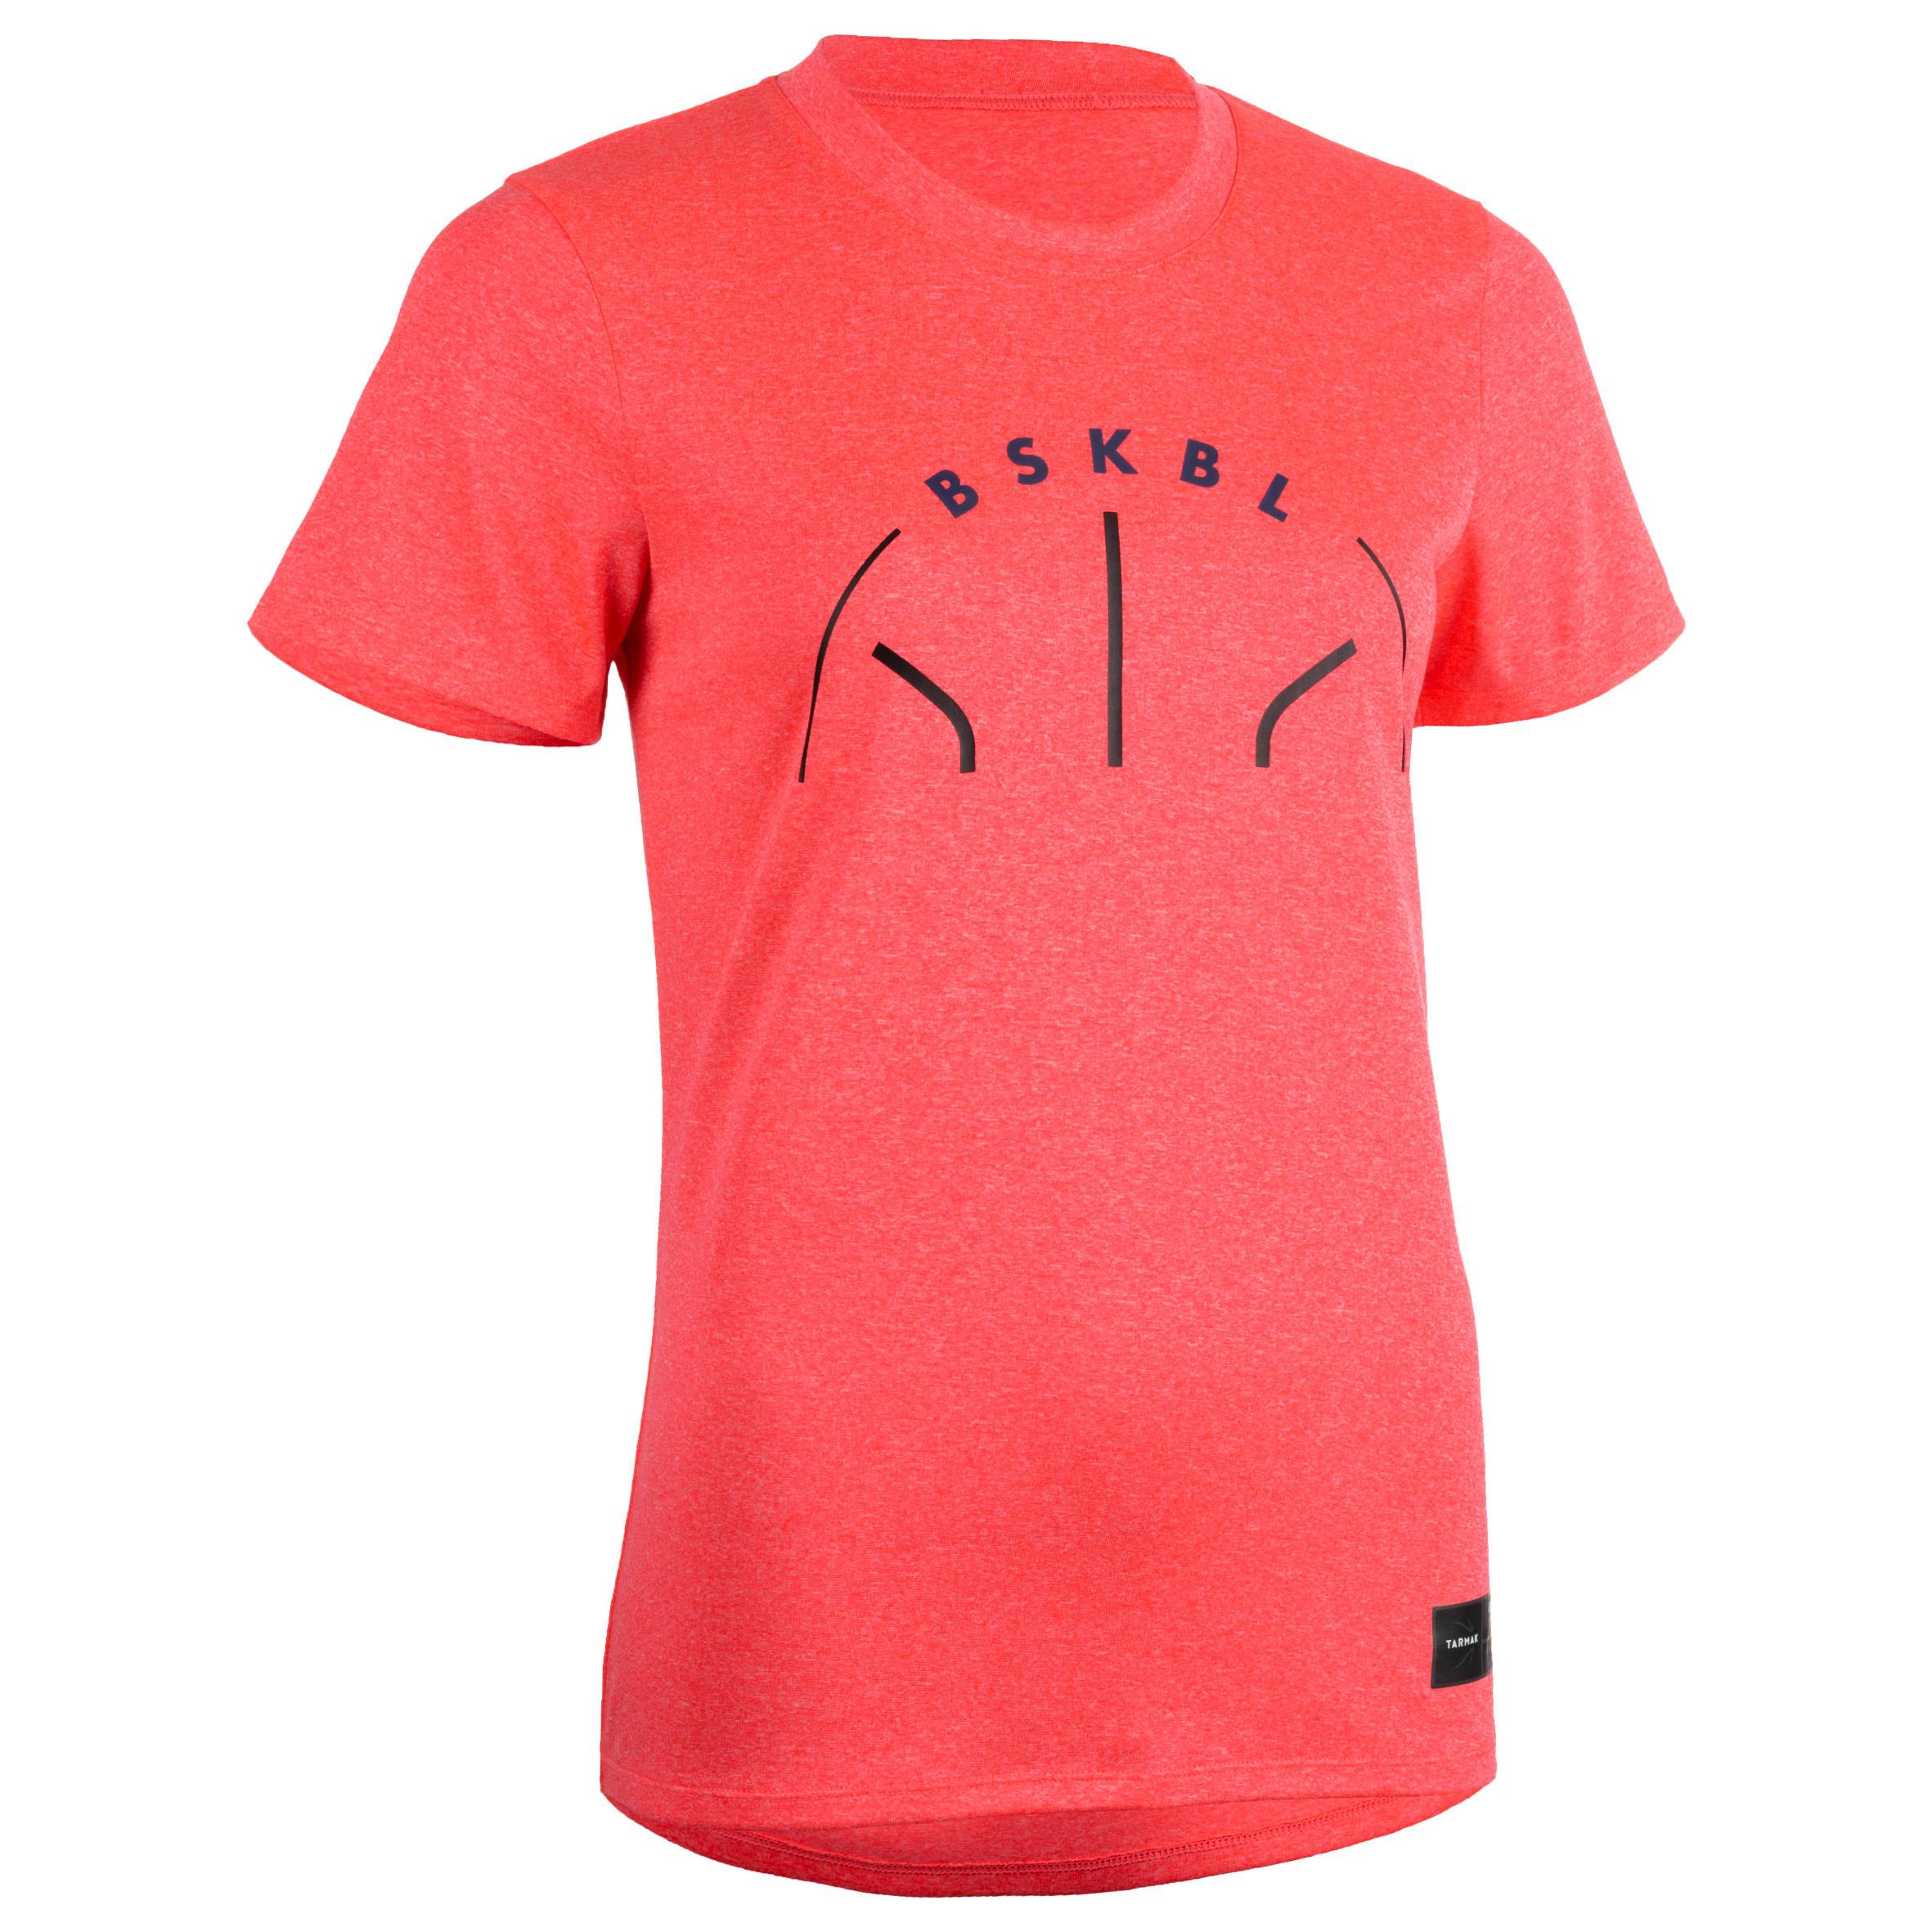 Basketballshirt Trikot TS500 Damen rosa